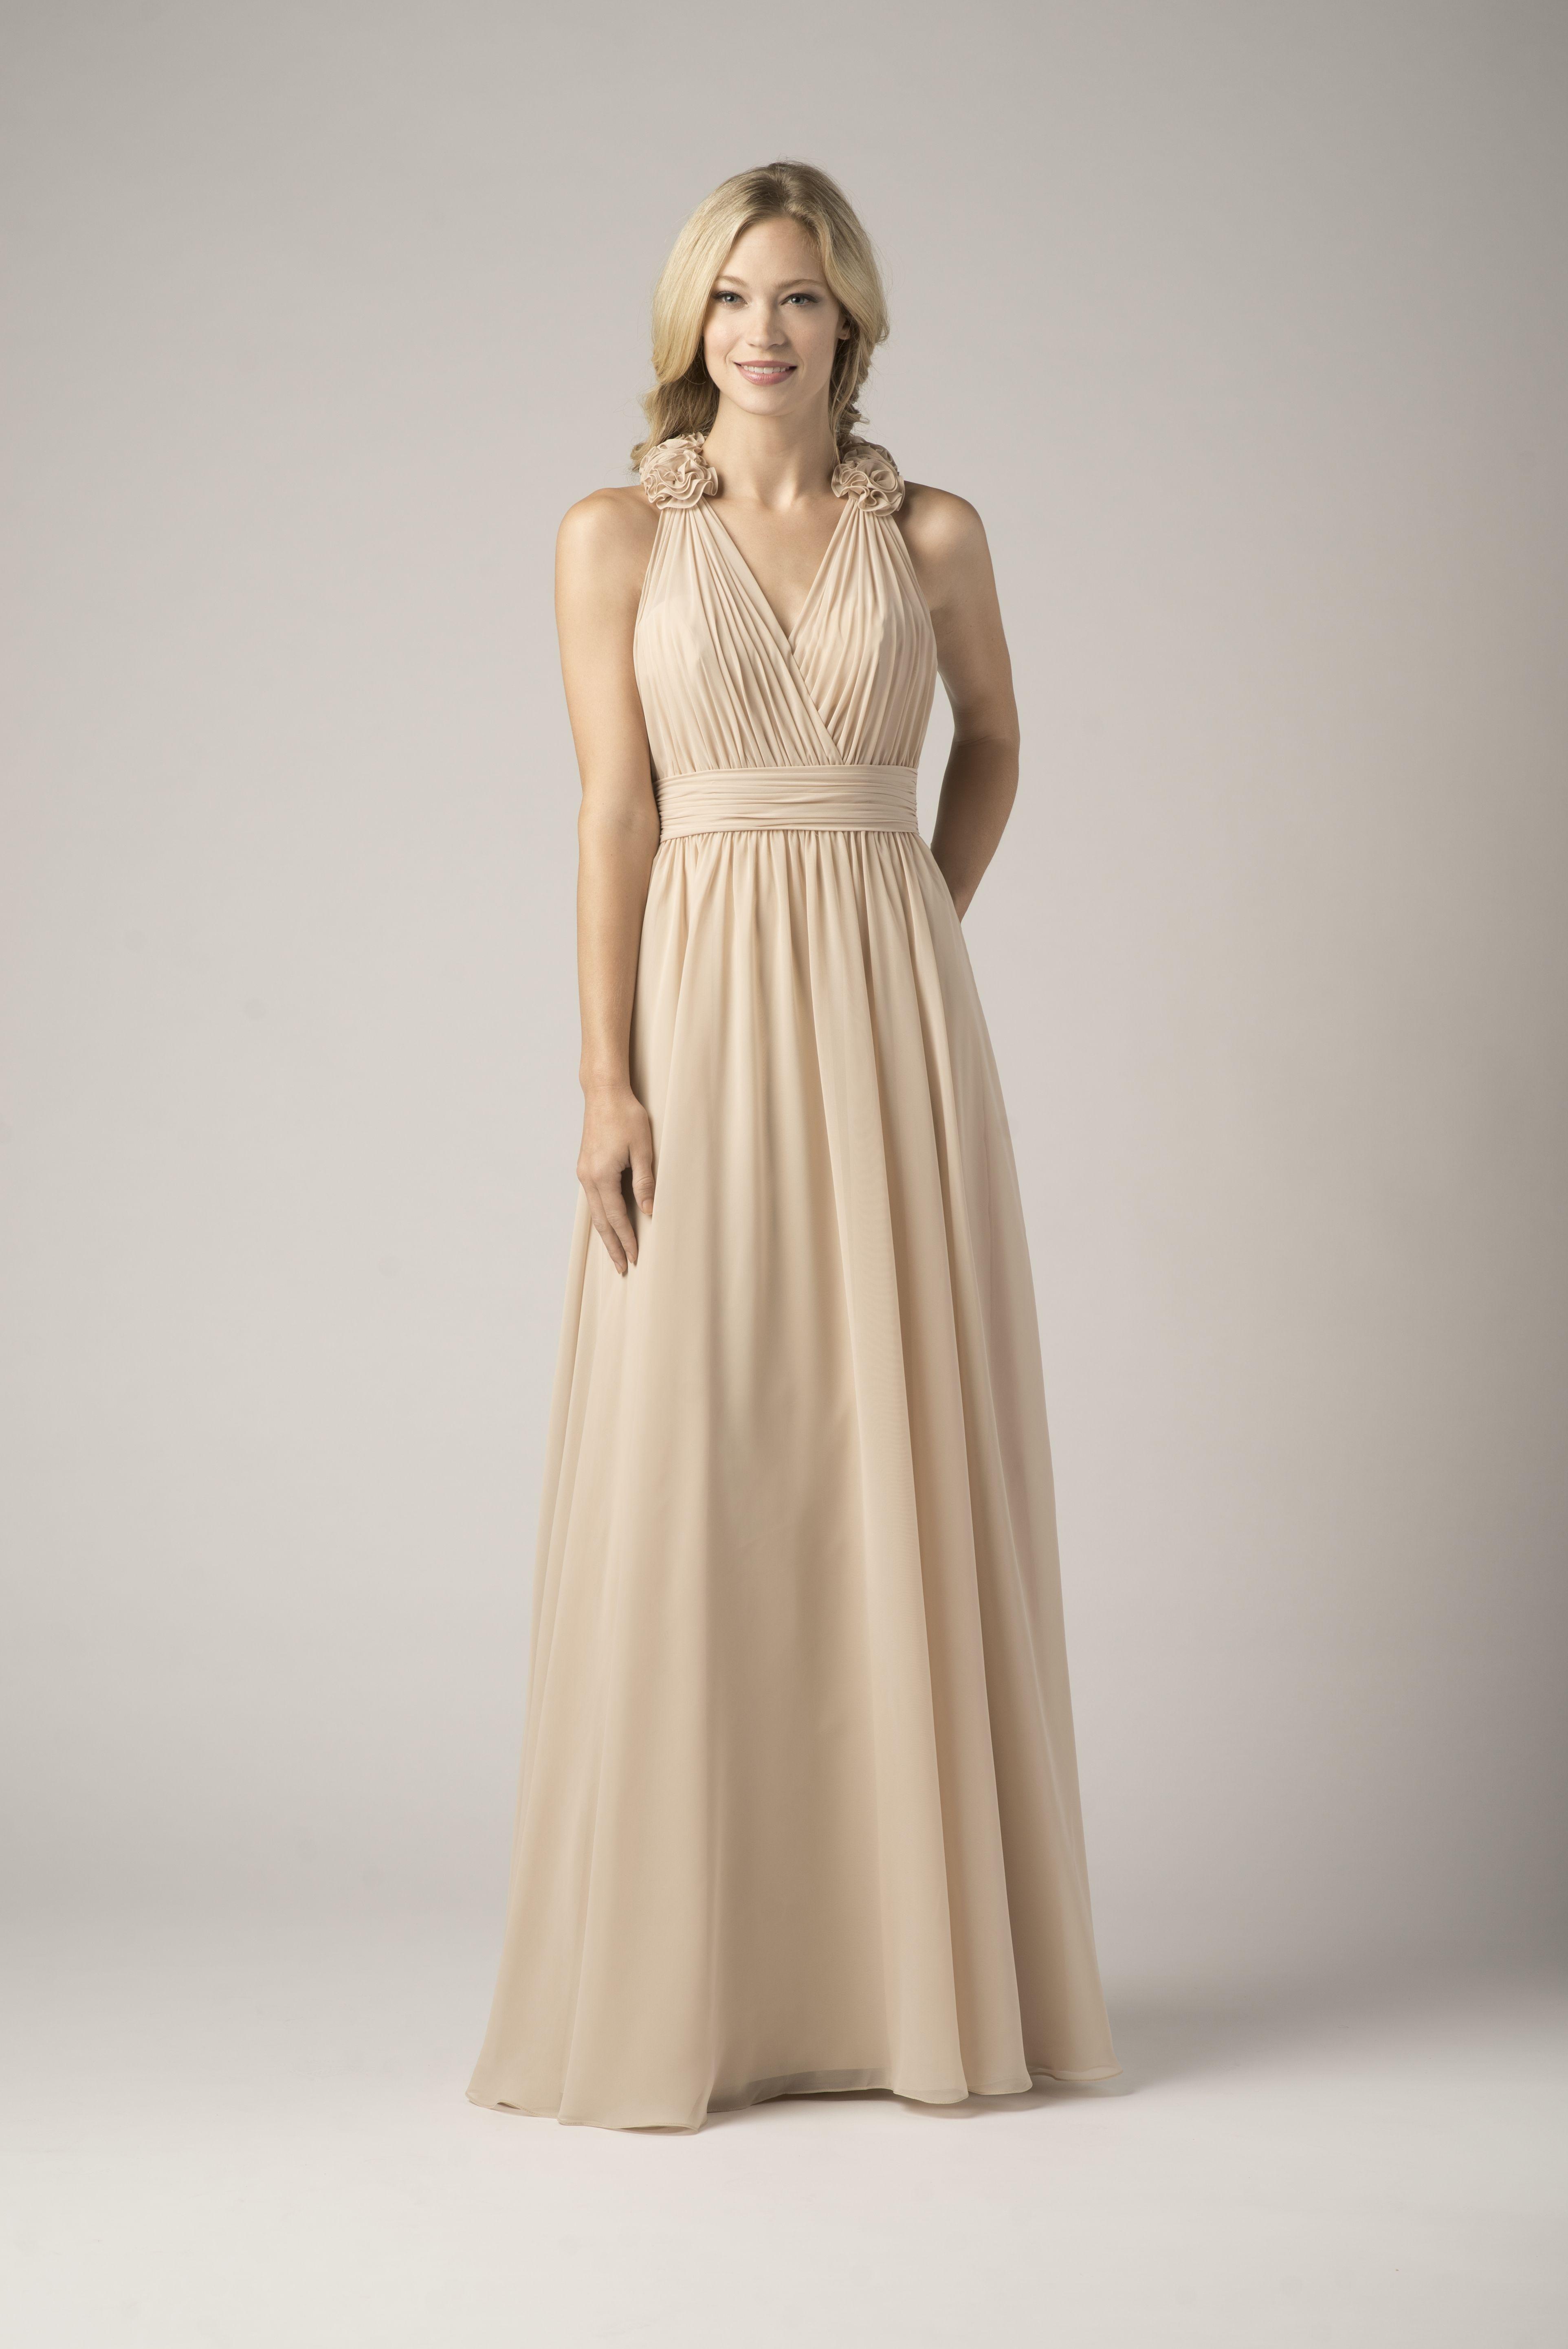 Wtoo Bridesmaid 804 In Cashmere Gorgeous Bridesmaid Dresses Floor Length Chiffon Bridesmaid Dresses Cheap Bridesmaid Dresses